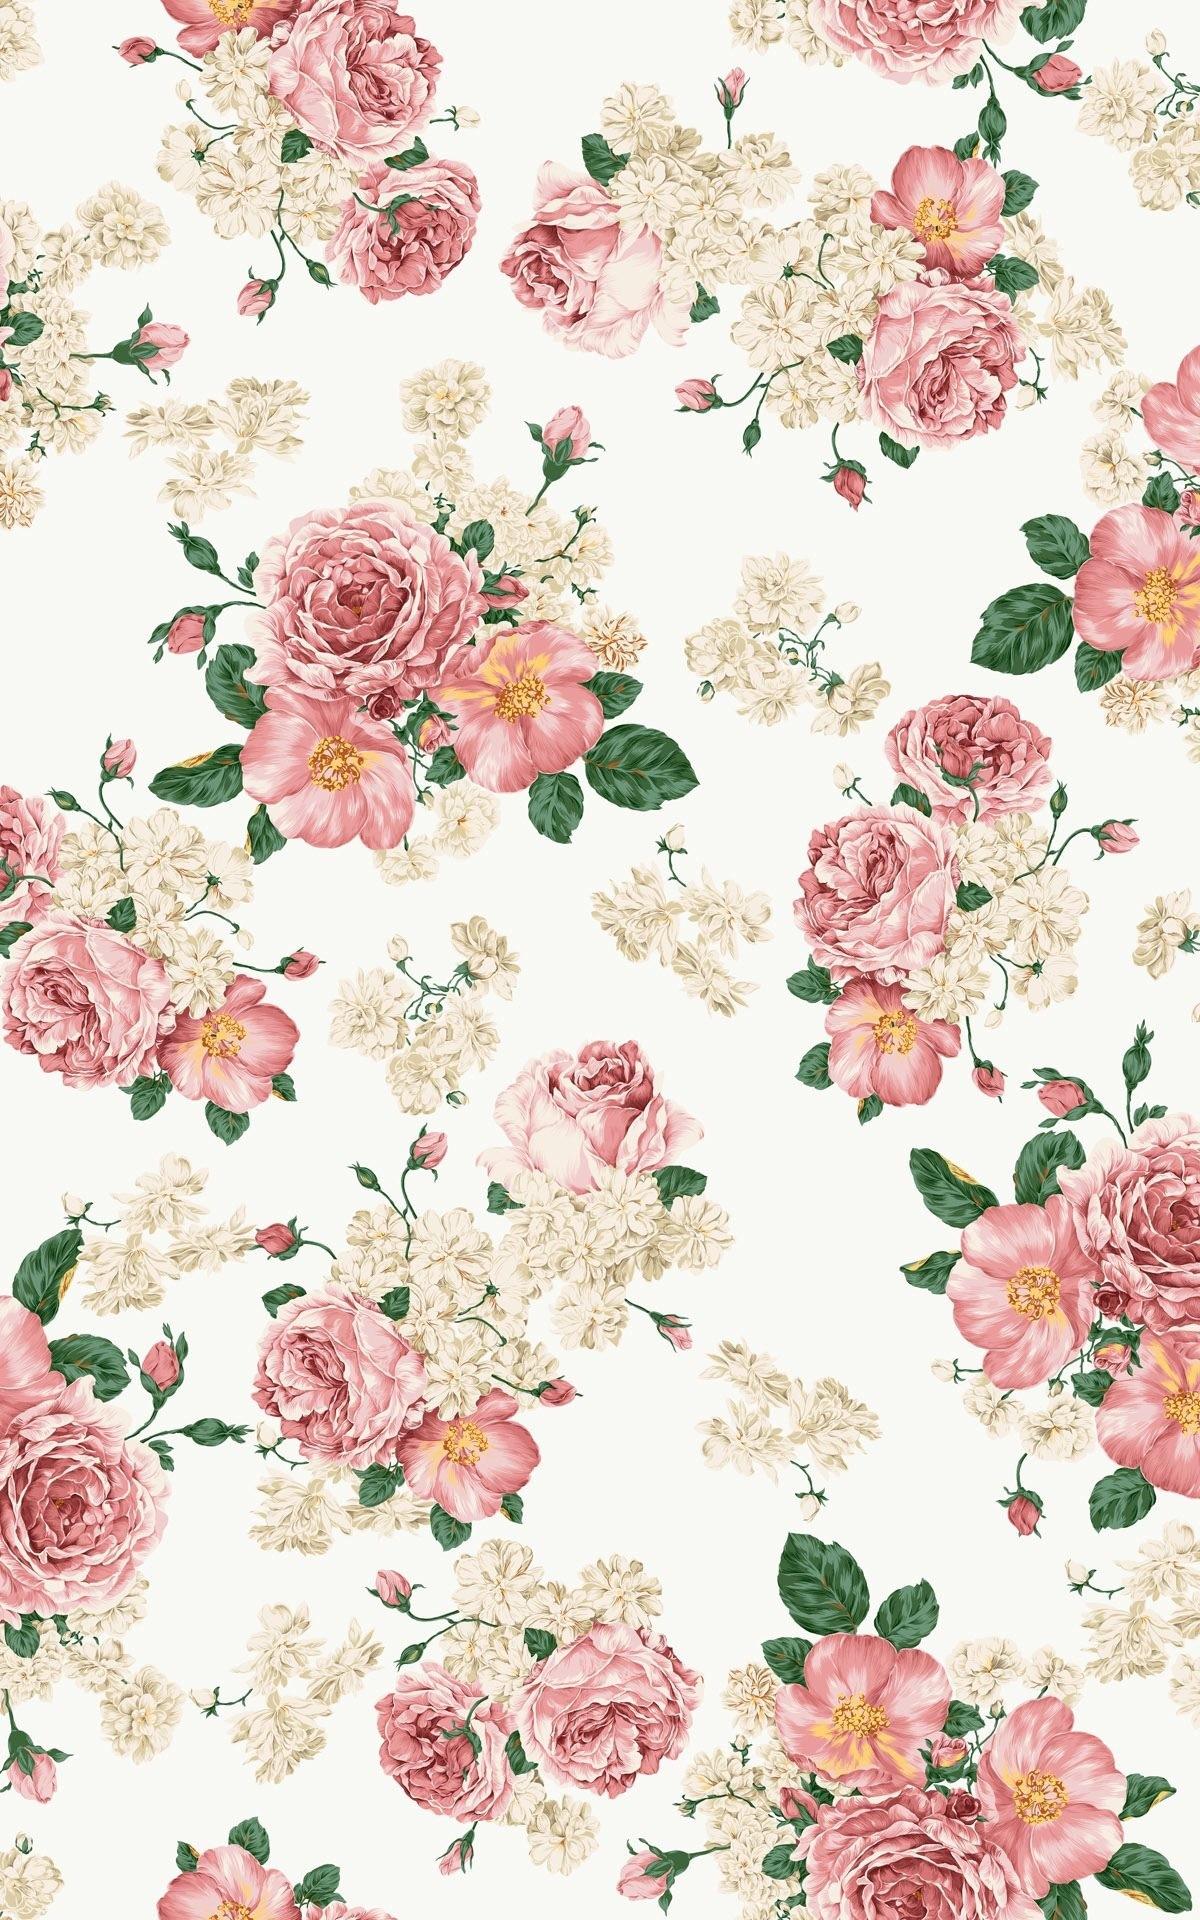 Pink flower wallpaper 74 images 1920x1080 pink flowers wallpaper 19327 mightylinksfo